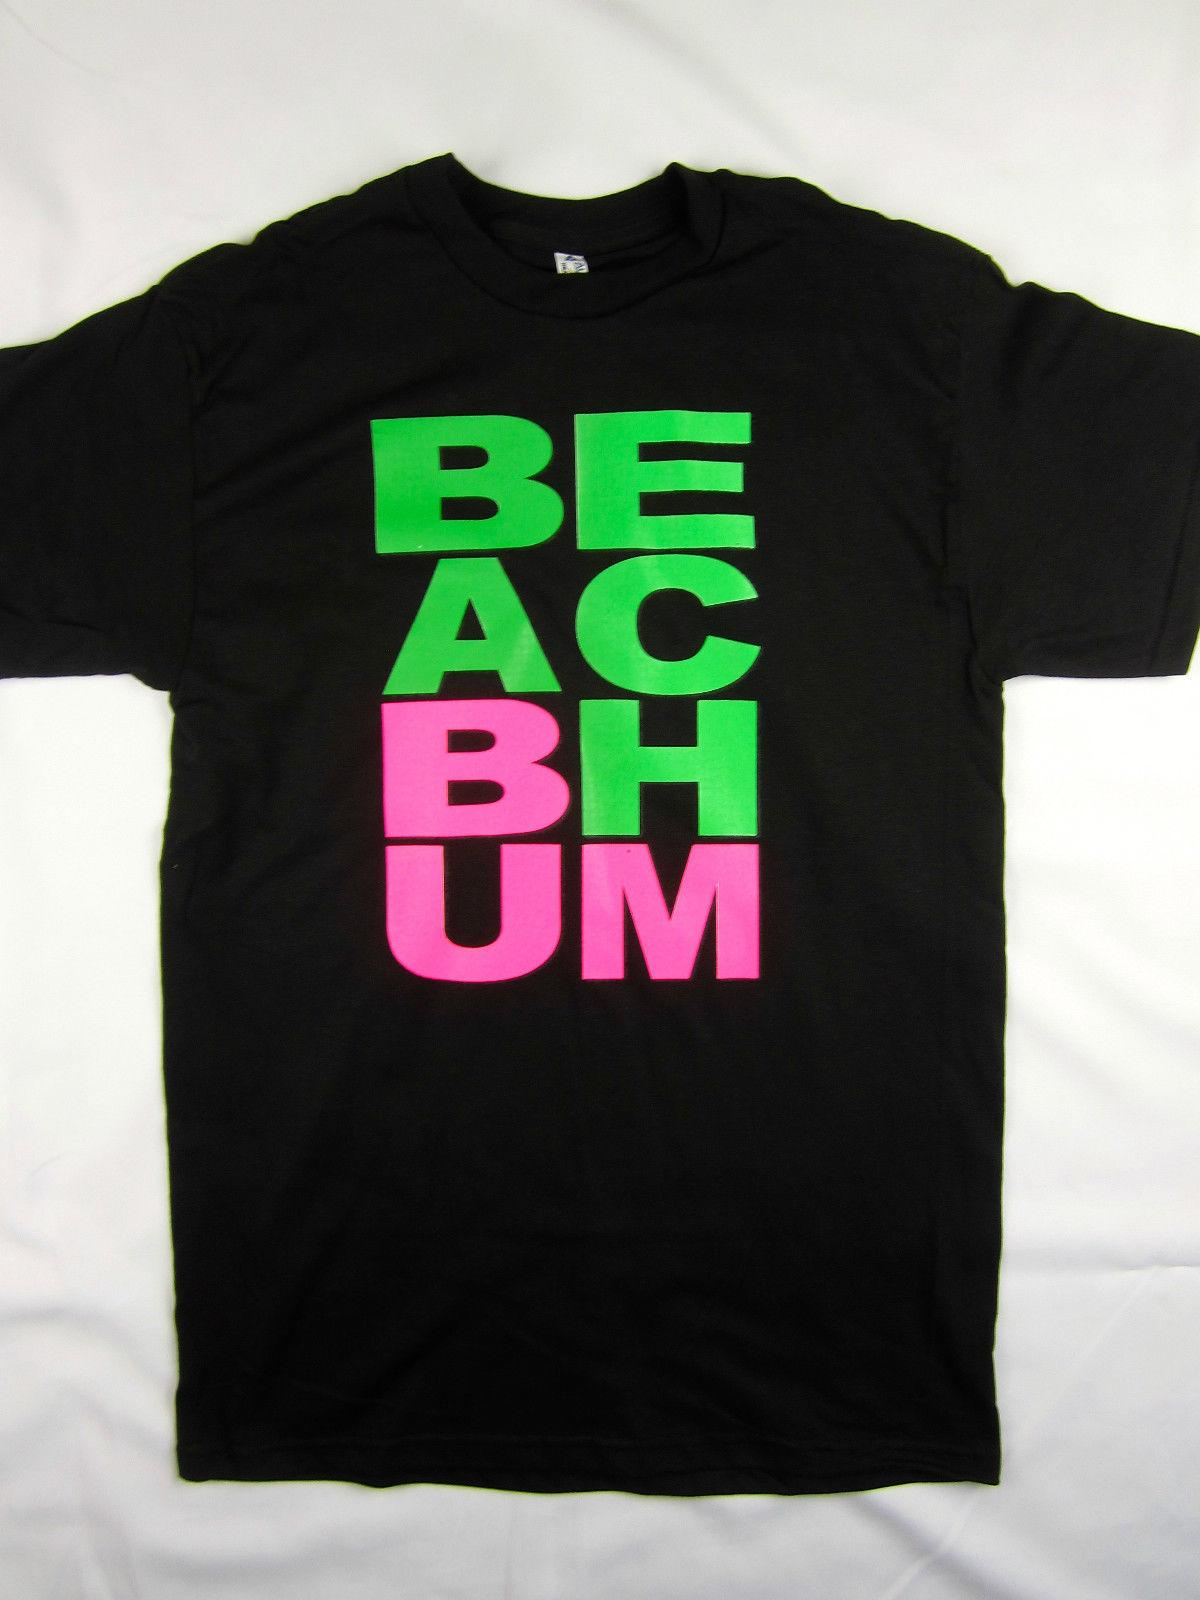 c7c250f5c Beach Bum casual style party tee shirt men's black choose A size 2018 New  Brand Mens T Shirt Cotton Short Sleeve print New High